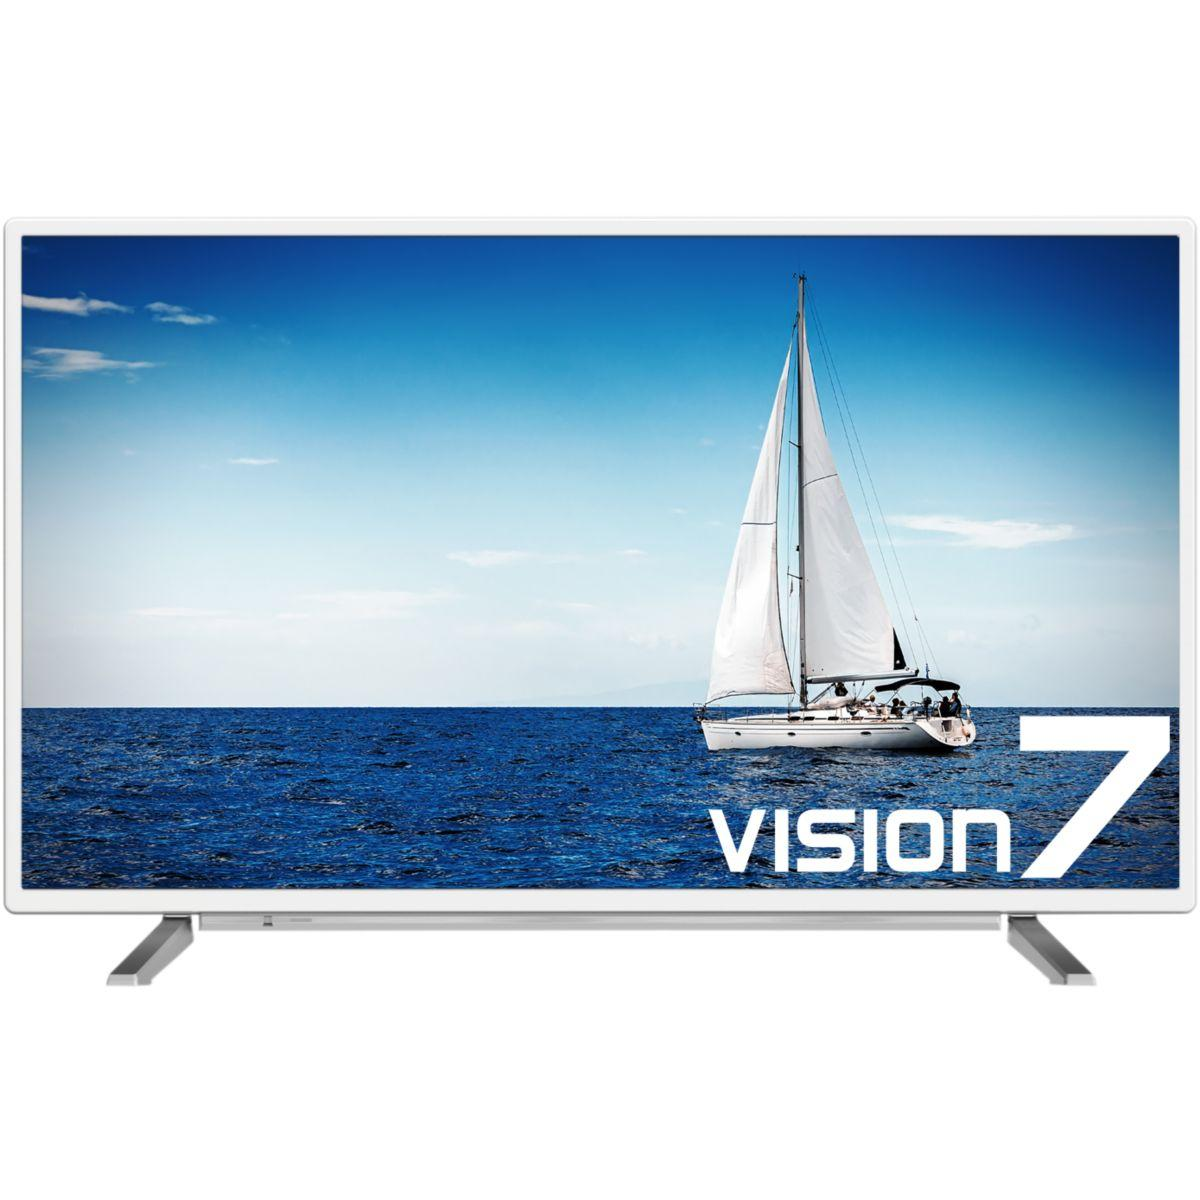 Tv grundig 49vlx7730wp - 2% de remise imm�diate avec le code : noel2 (photo)